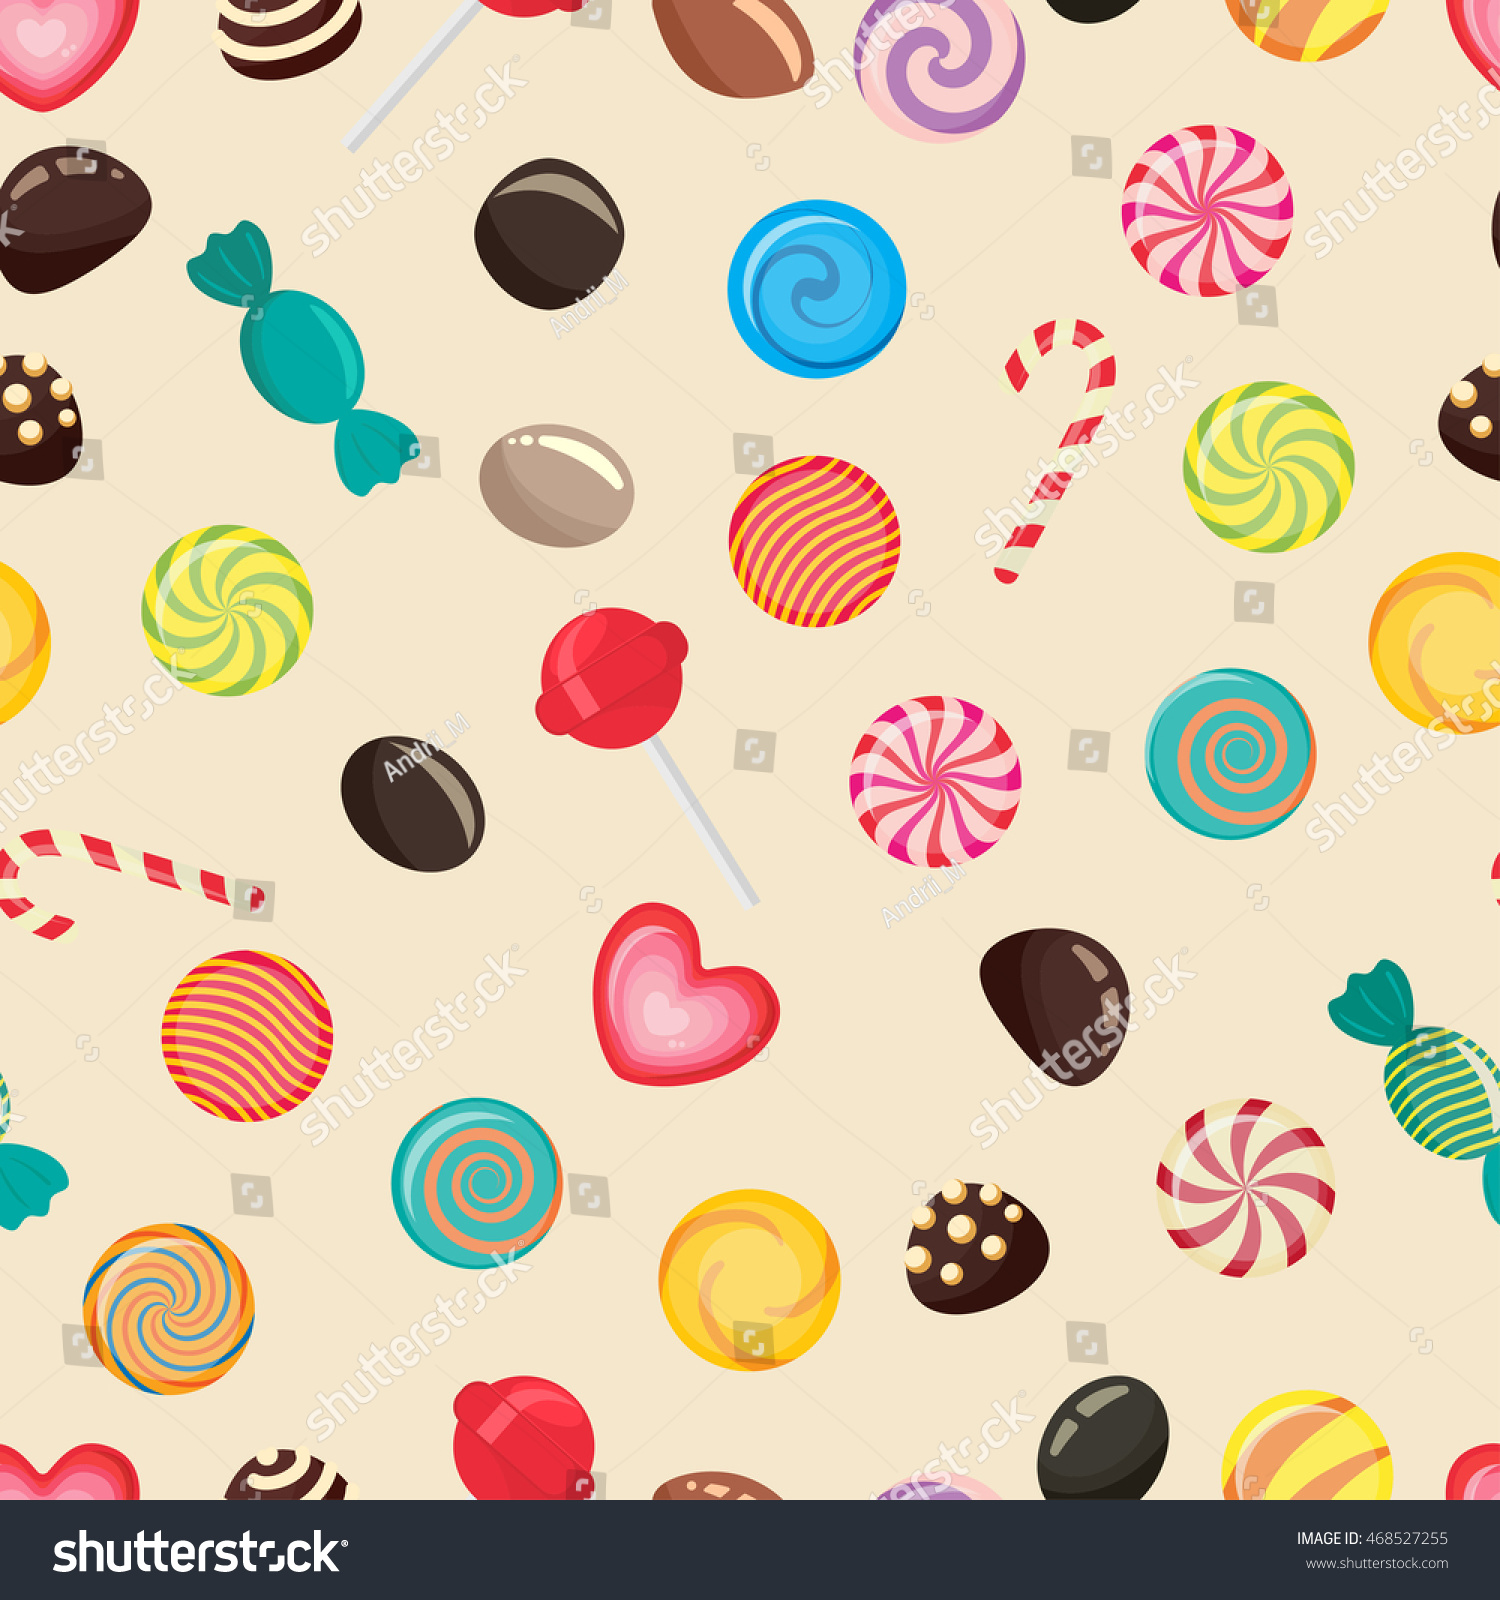 Sweet Candy Seamless Pattern Caramel Lollipop Stock Vector ...